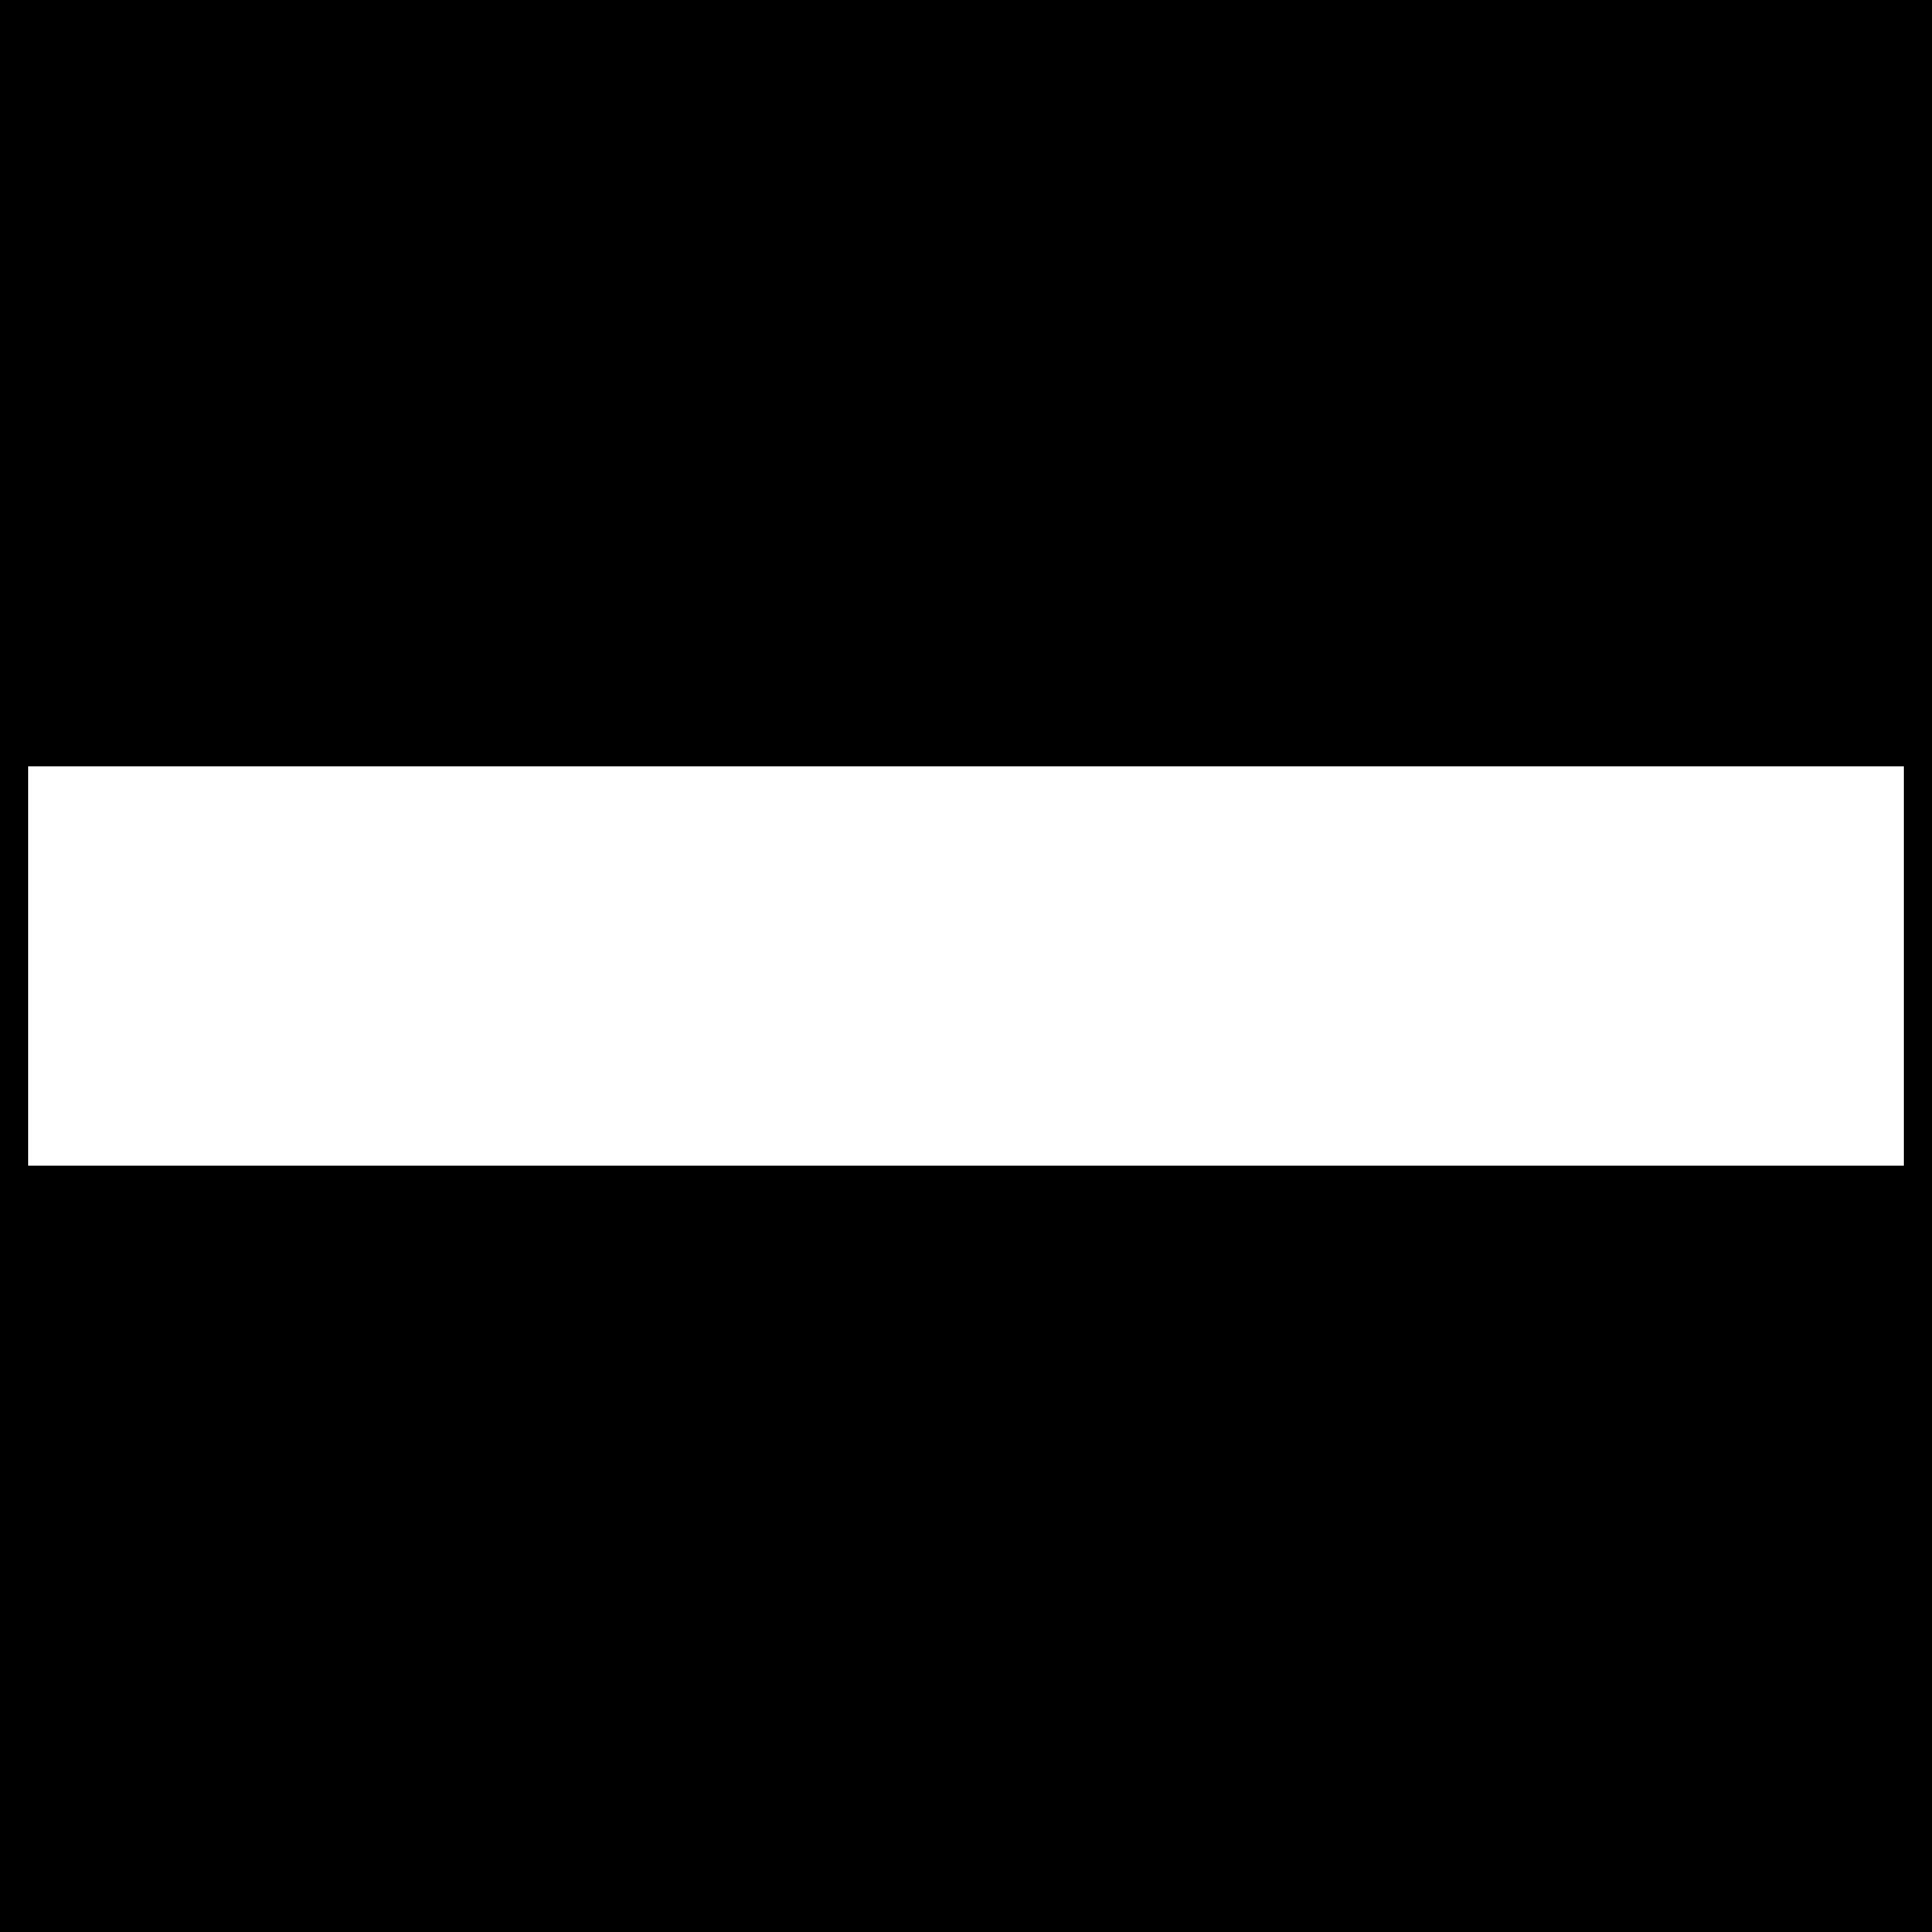 National Car Rental Logo Black And White